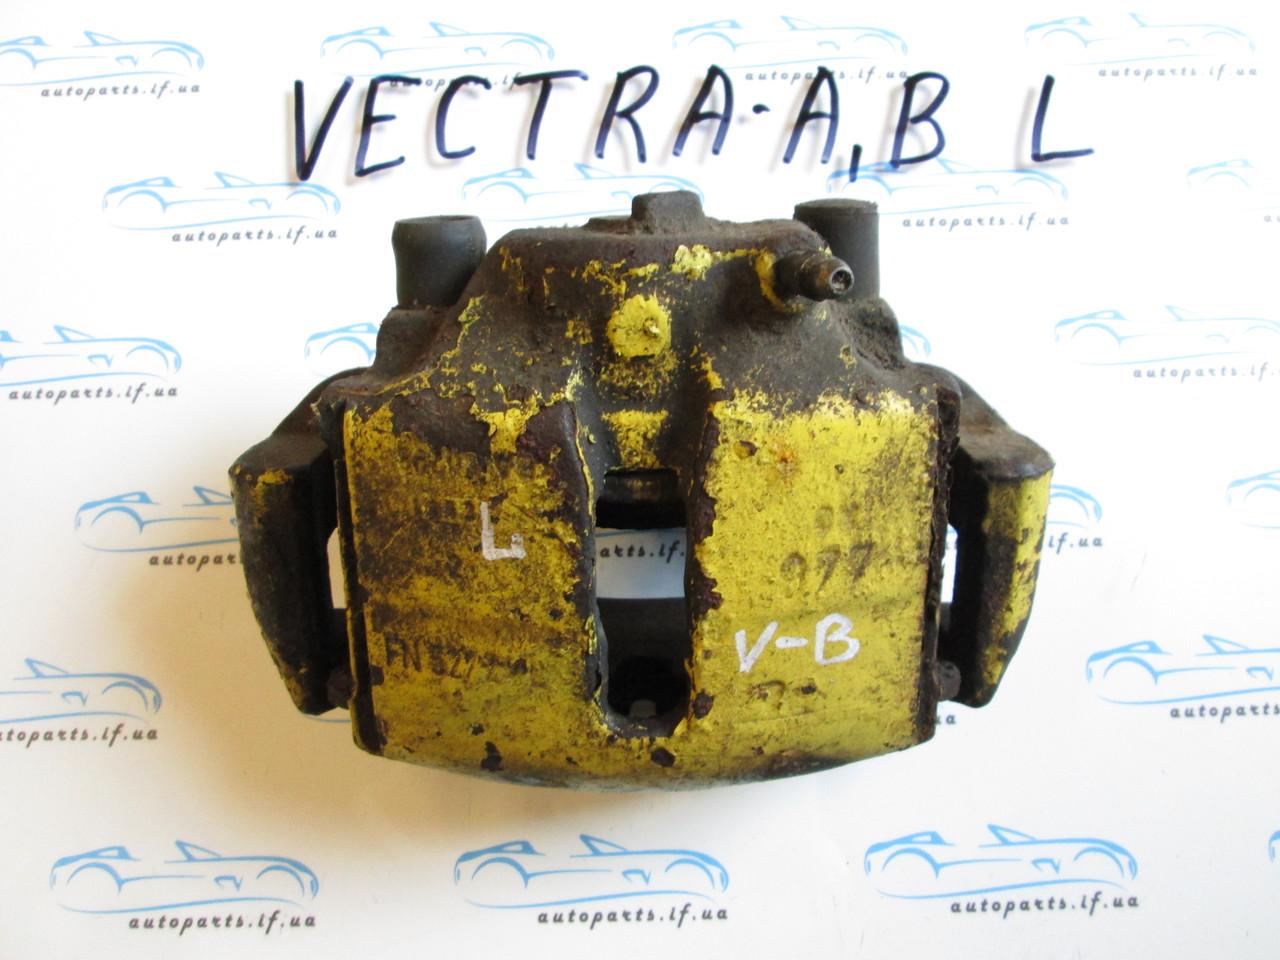 Суппорт передний левый Vectra A, Вектра А